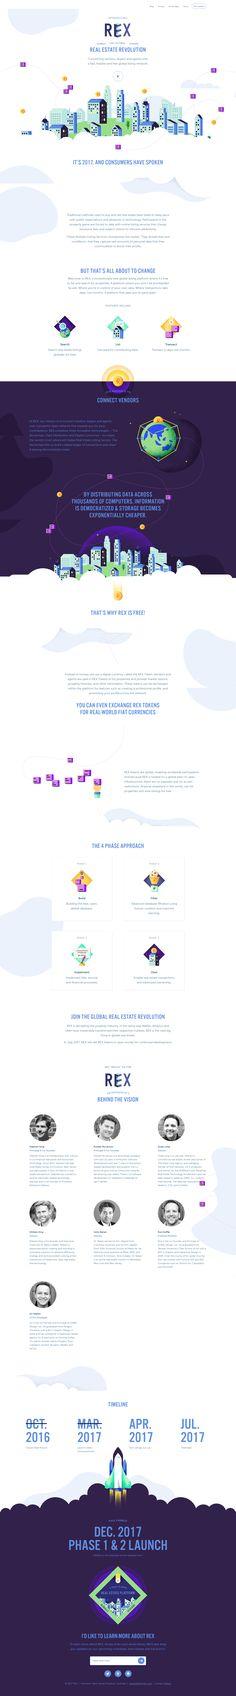 REX mentioned at @designersbyte for #DesignInspiration https://designersbyte.com/rex/